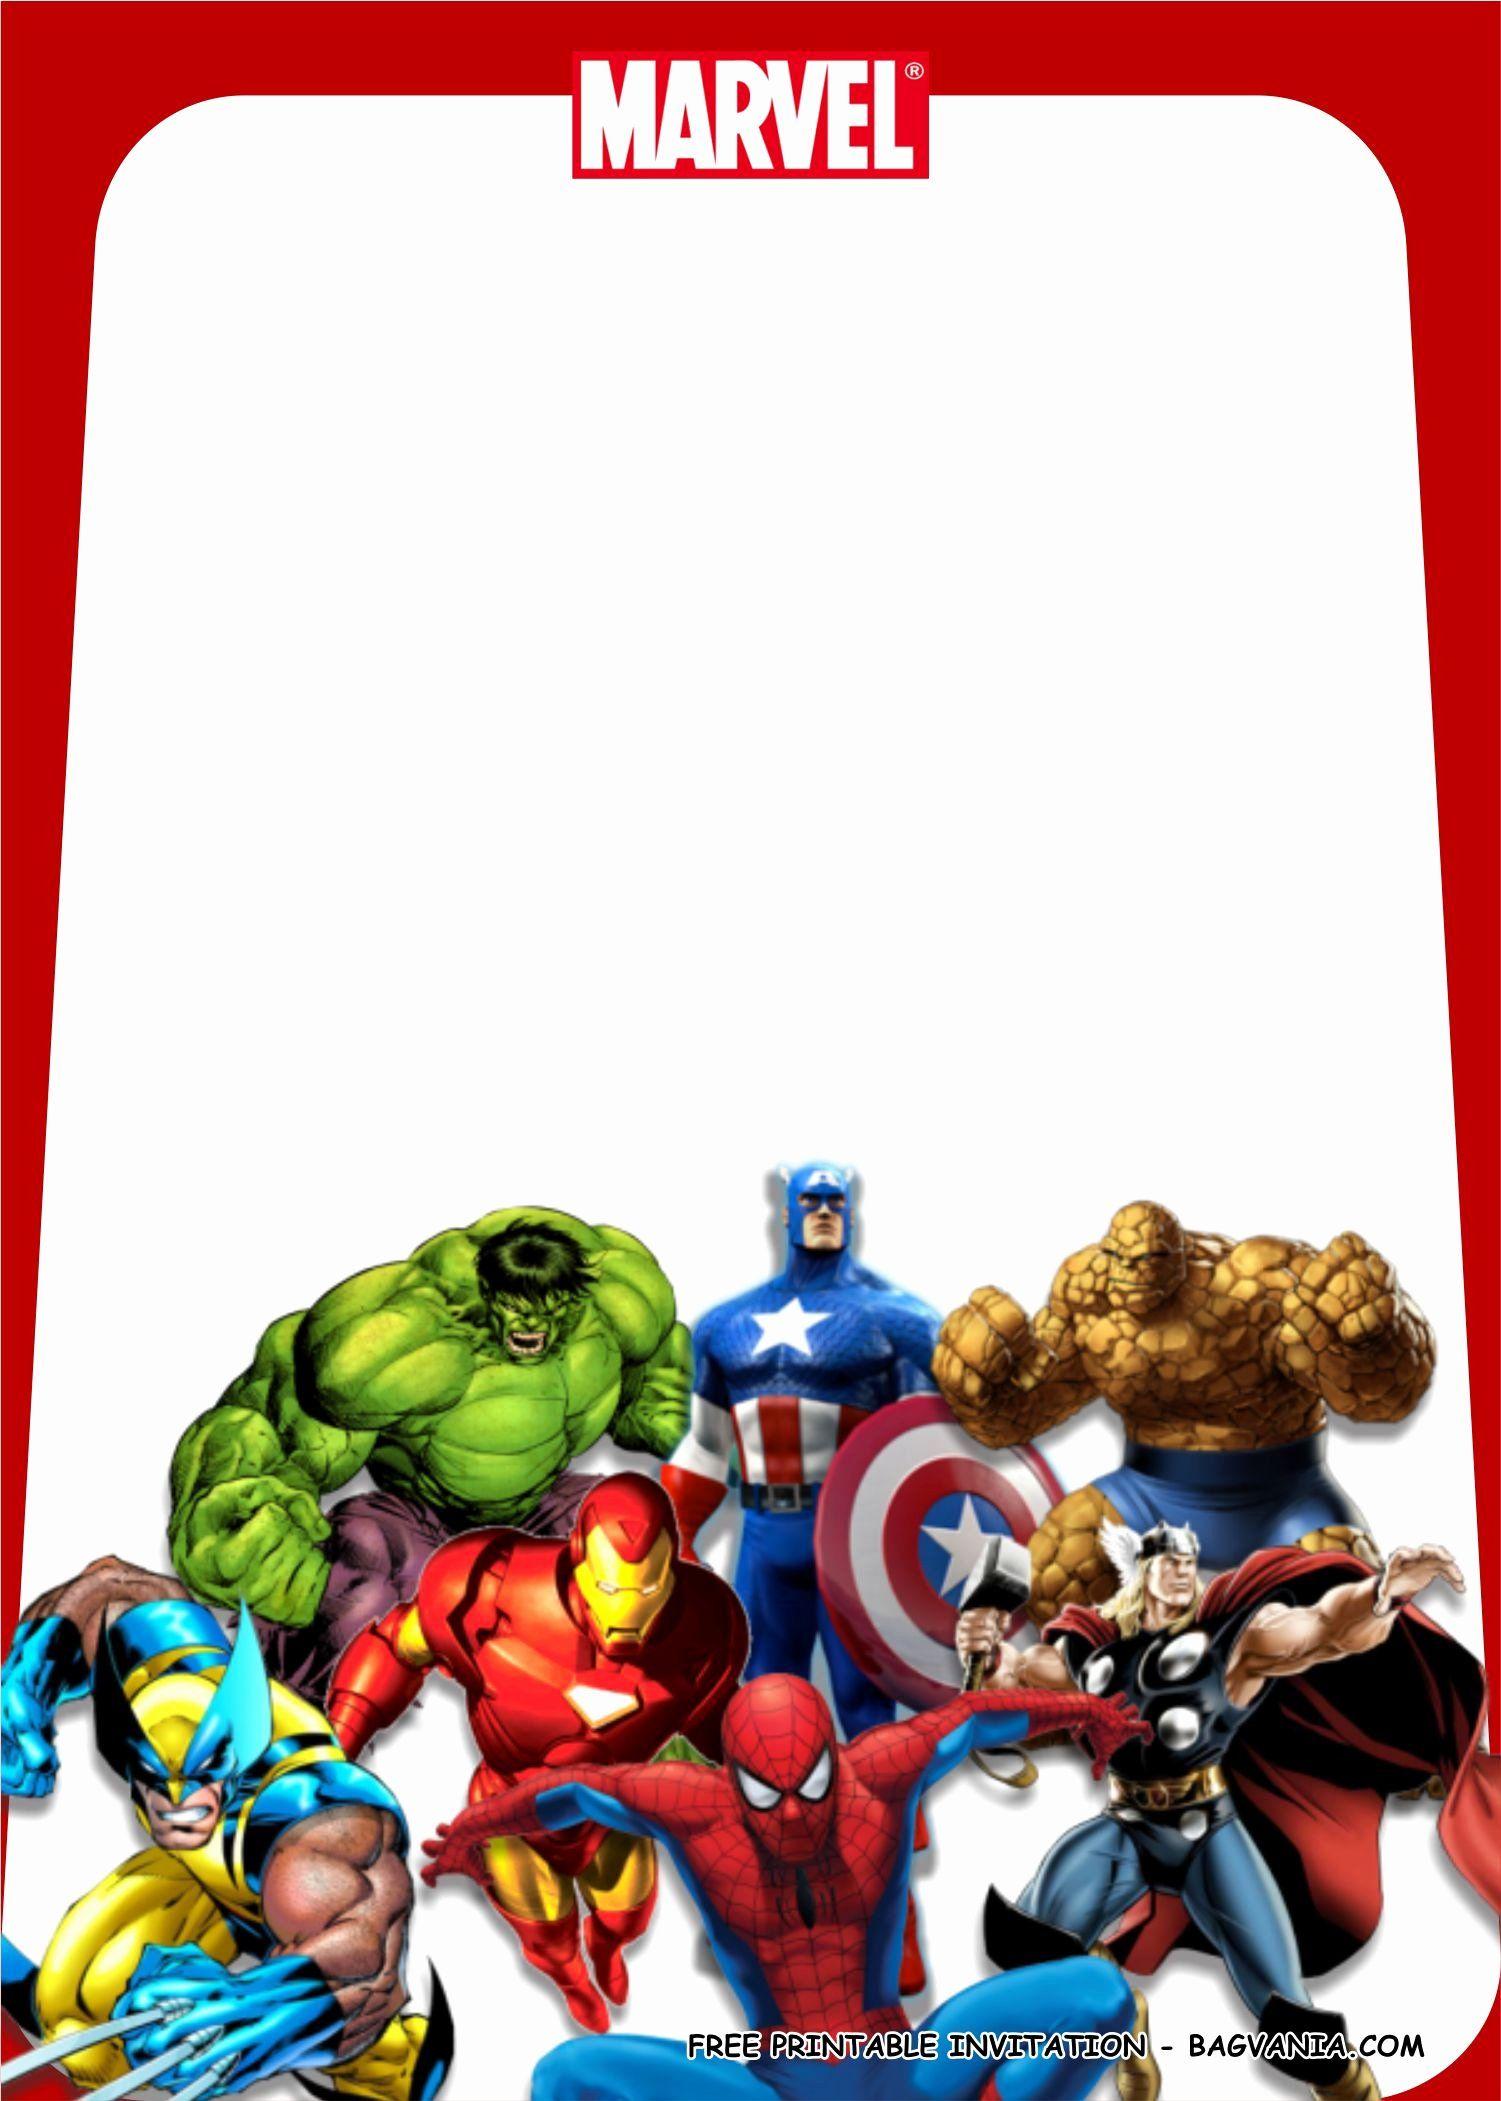 Superhero Invitation Template Free Luxury Free Printable Superhero Birthday Party Kits Superhero Invitations Birthday Card Template Superhero Party Invitations